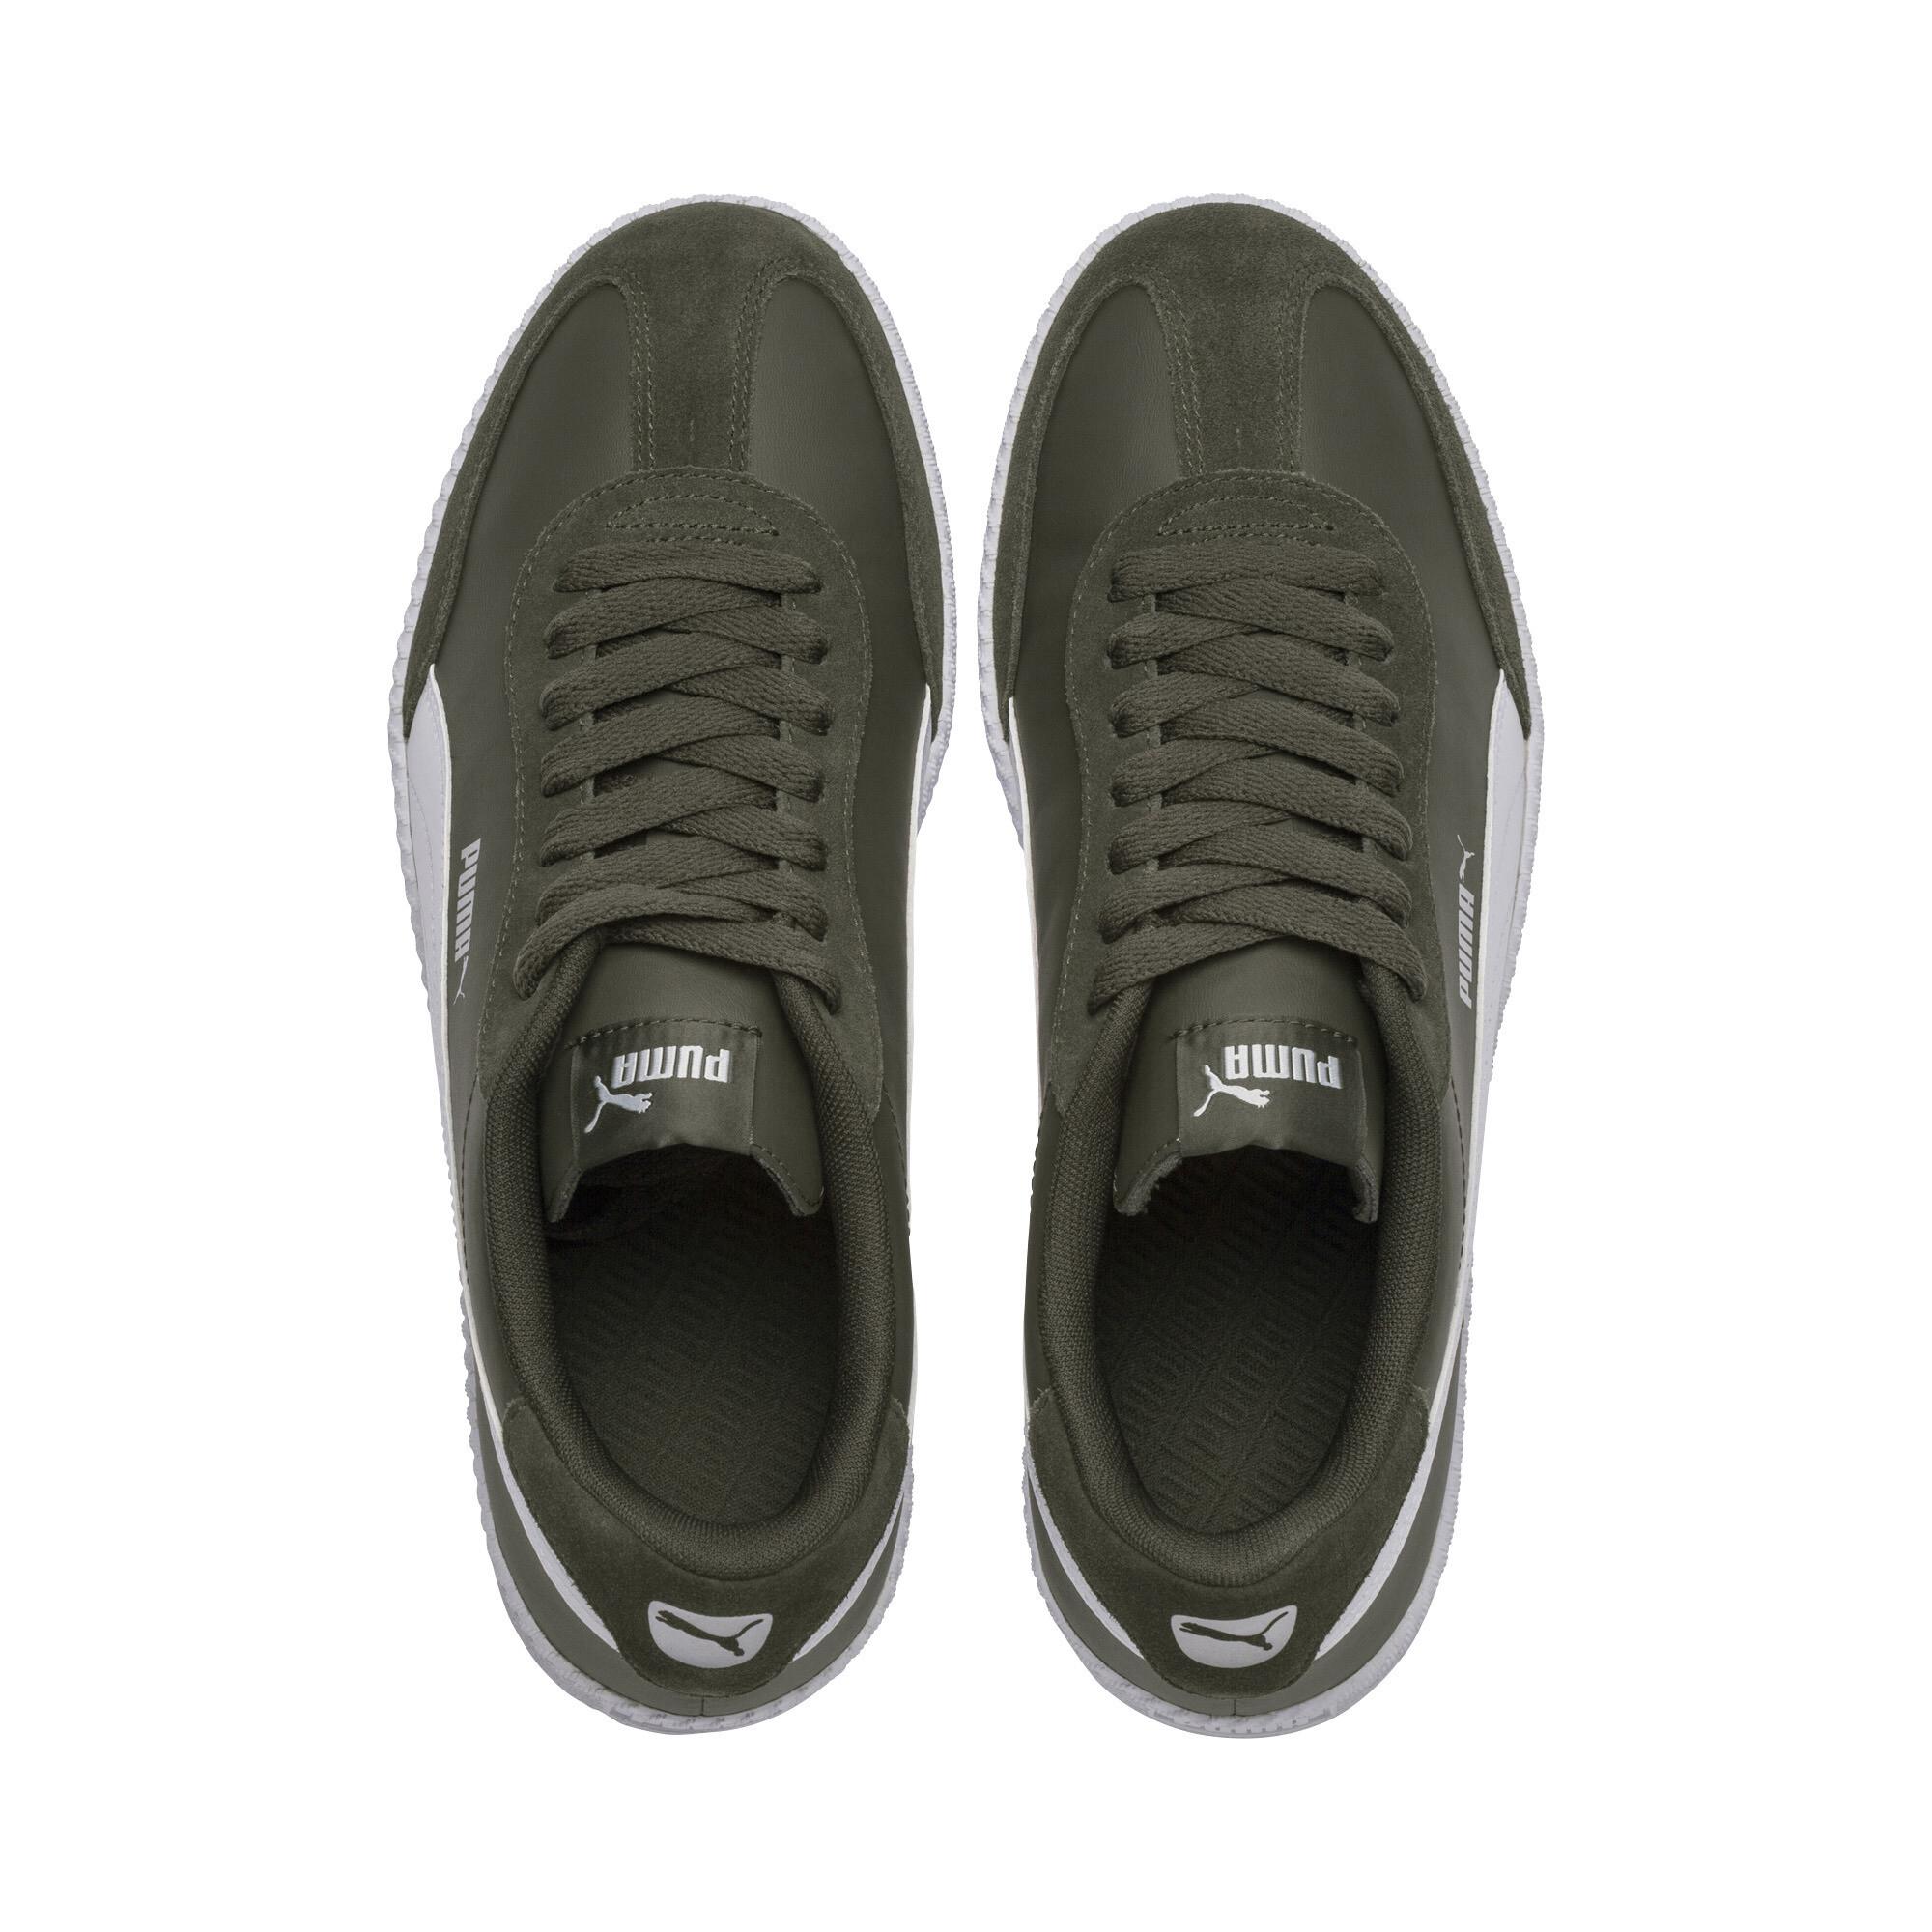 PUMA-Astro-Cup-Men-039-s-Sneakers-Men-Shoe-Basics thumbnail 7